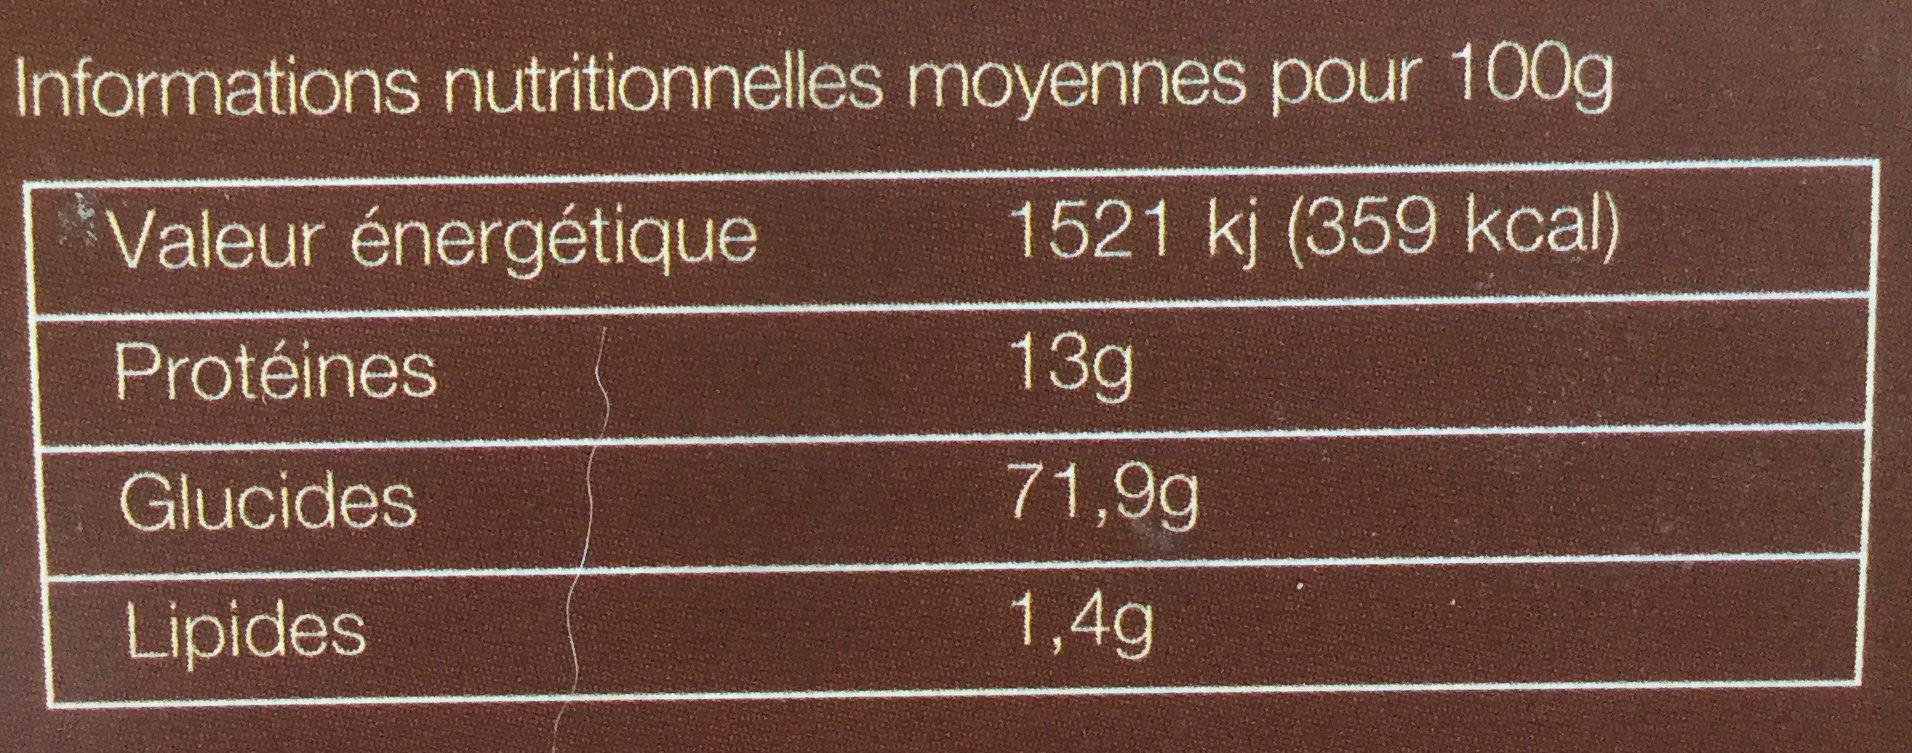 Fusilloni - Informations nutritionnelles